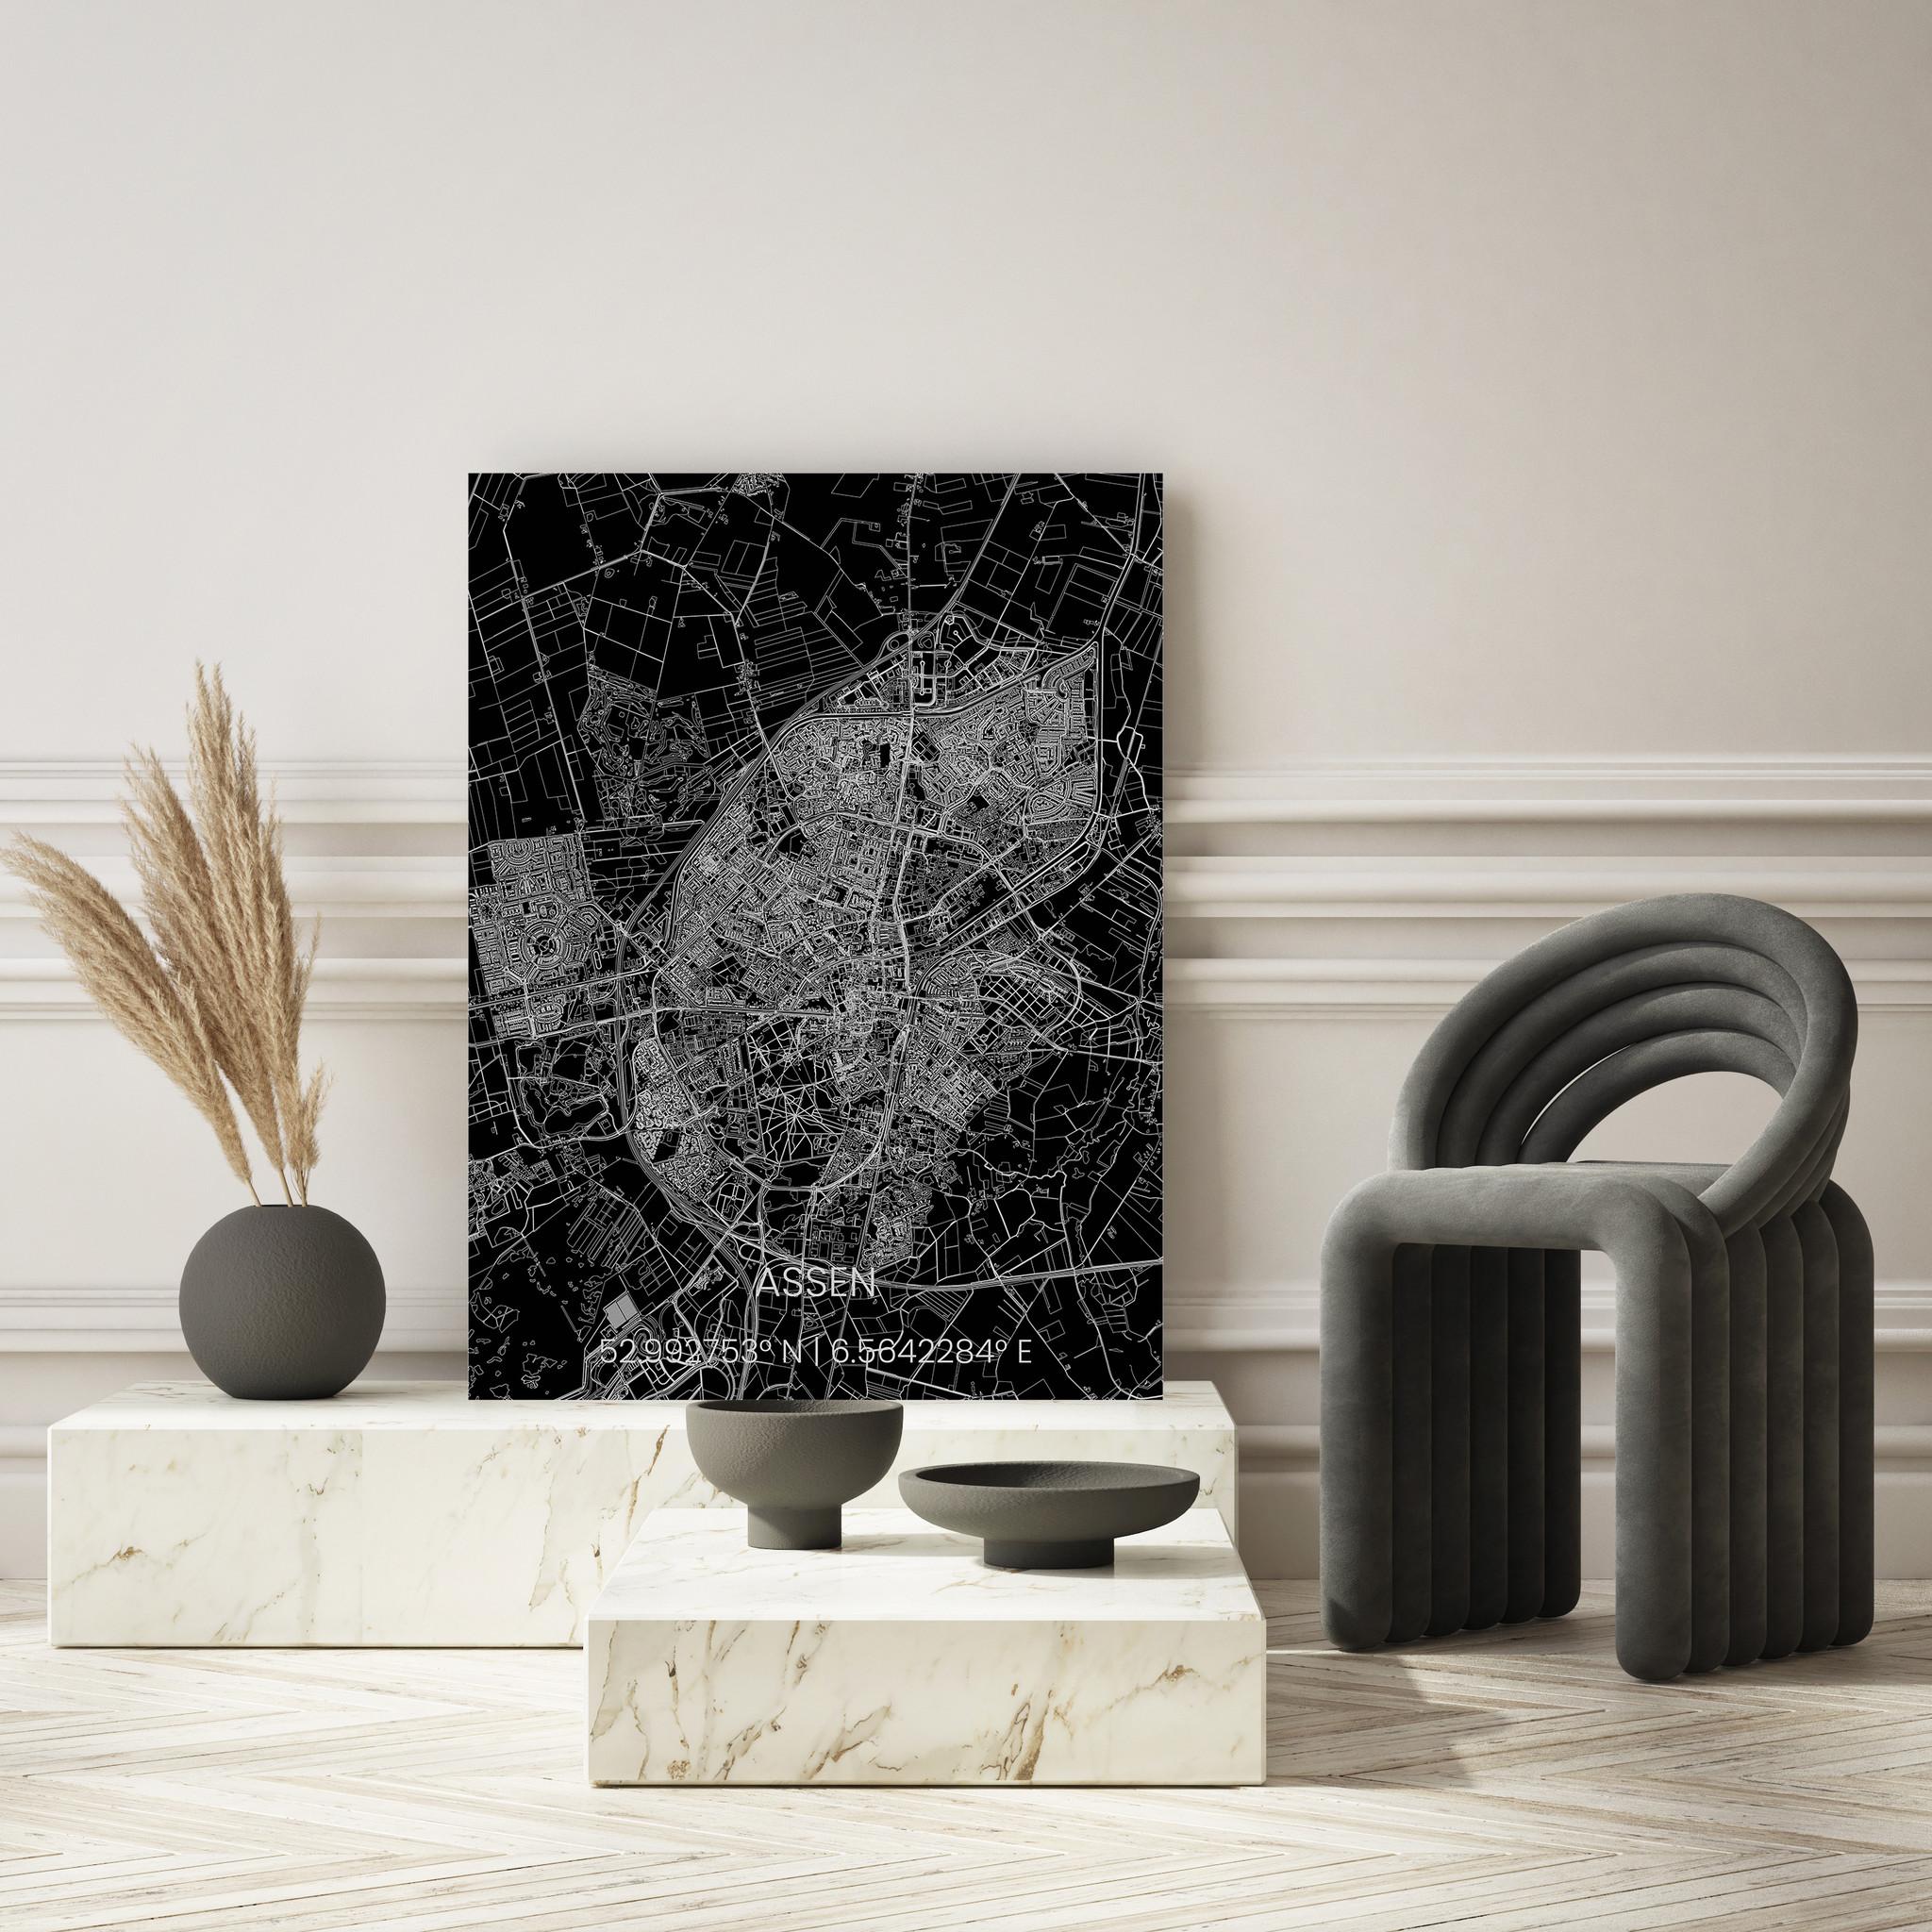 Metalen stadsplattegrond Assen-2